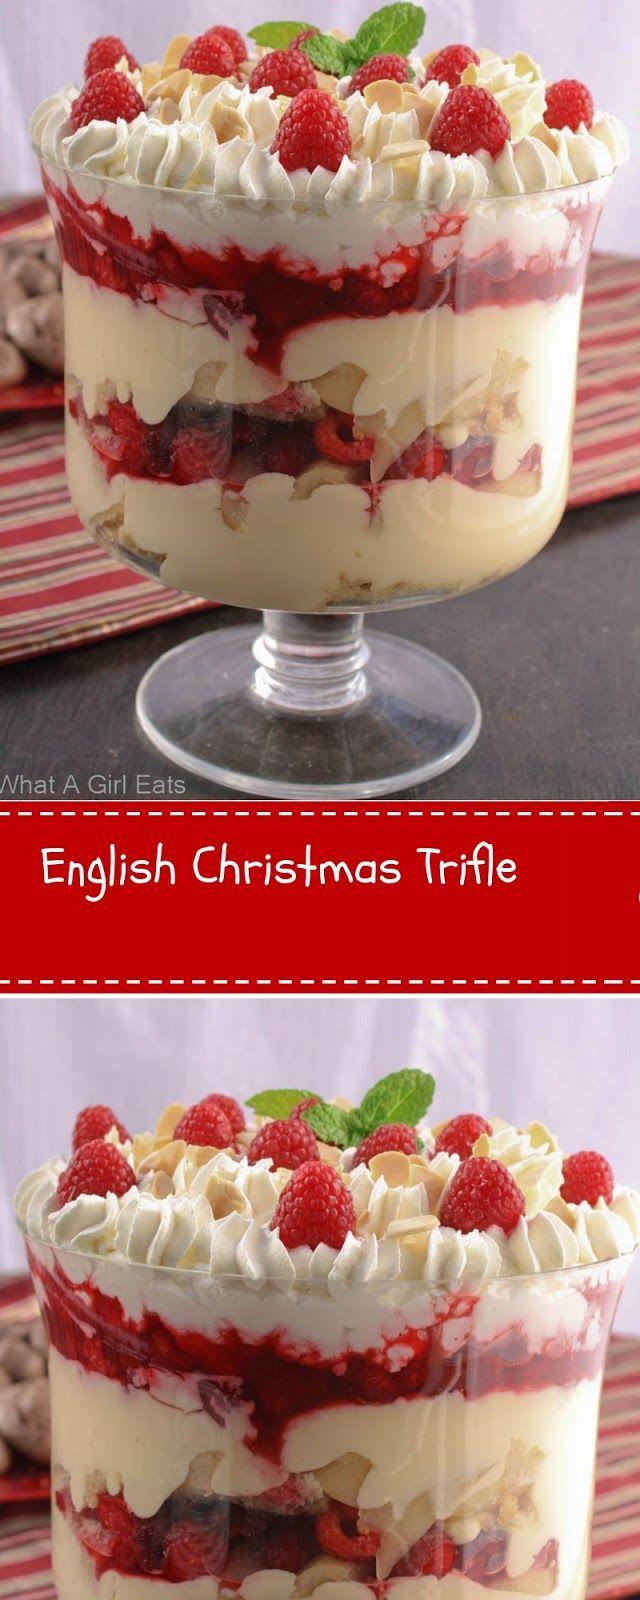 English Christmas Trifle Christmas Cookies Home Delicious Recipe